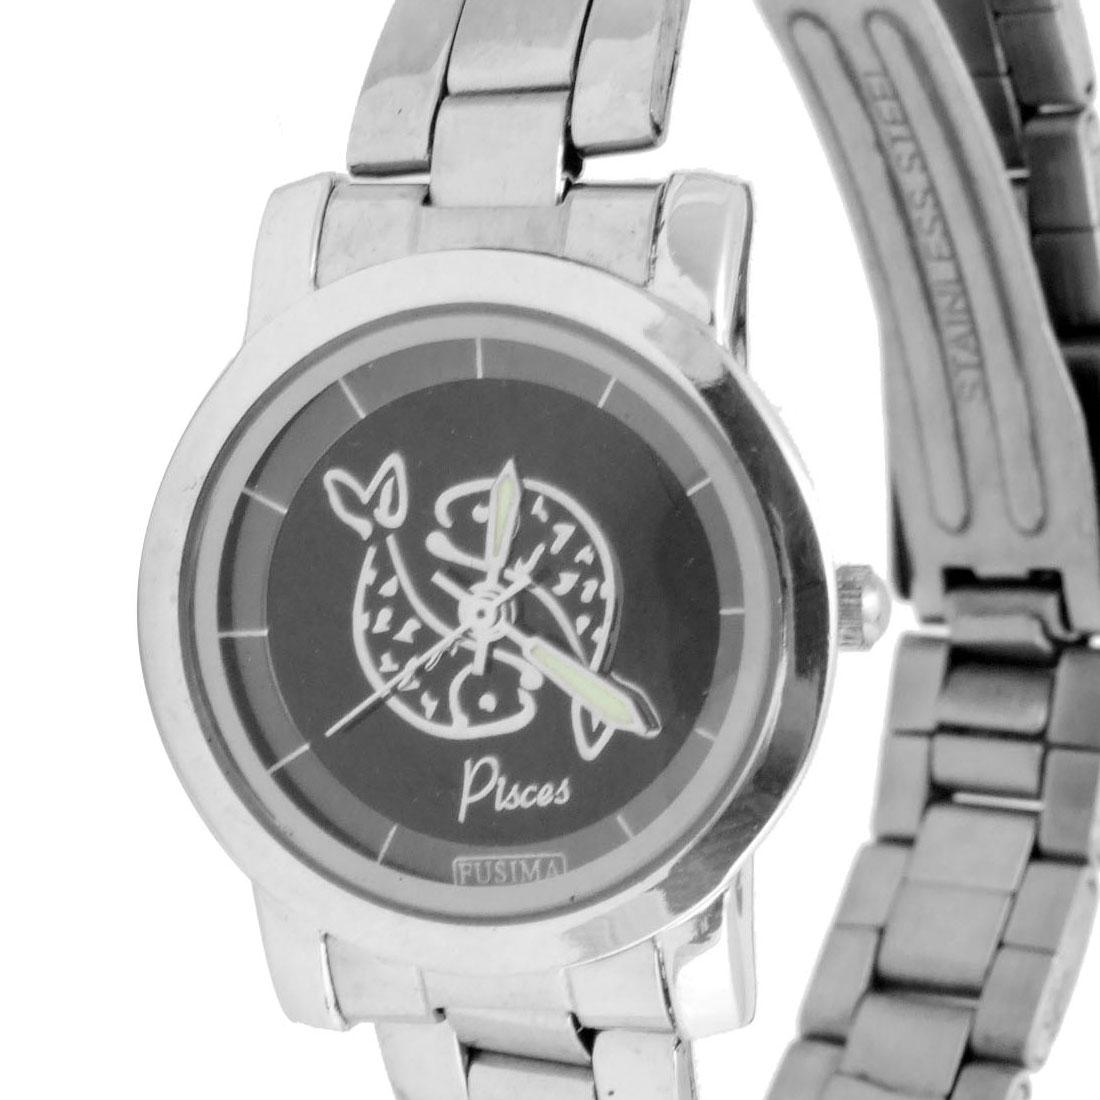 Fashion Jewelry Stainless Steel Quartz Watch - image 1 of 2